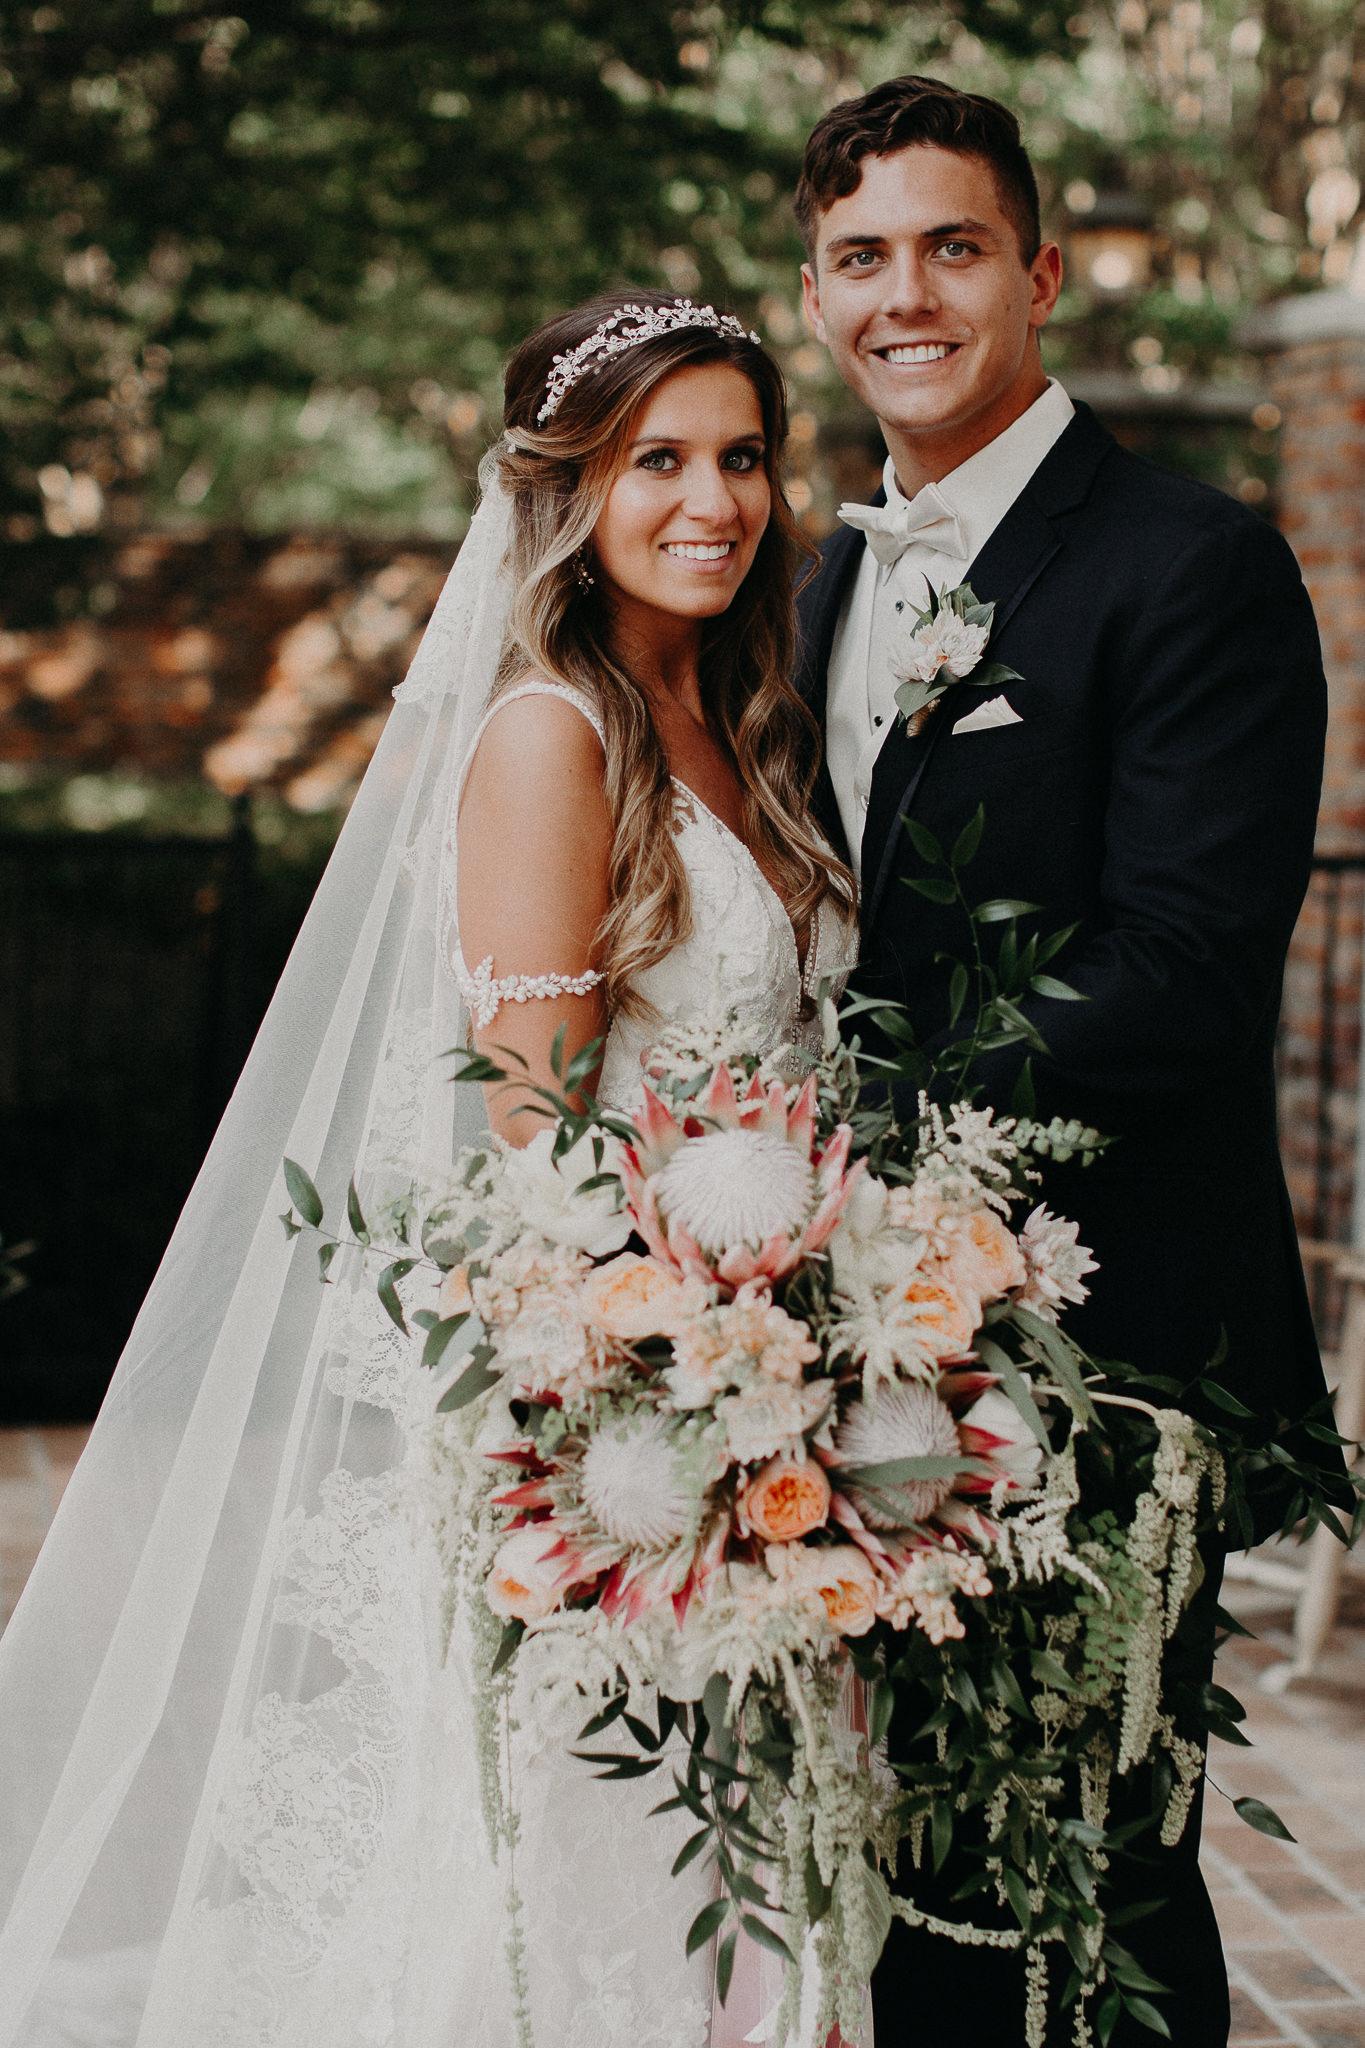 57 Carl House Wedding Venue Ga, Atlanta Wedding Photographer - Boho, Bohemian, Junebug Weddings, Vintage, Retro, Trendy. Aline Marin Photography._.JPG